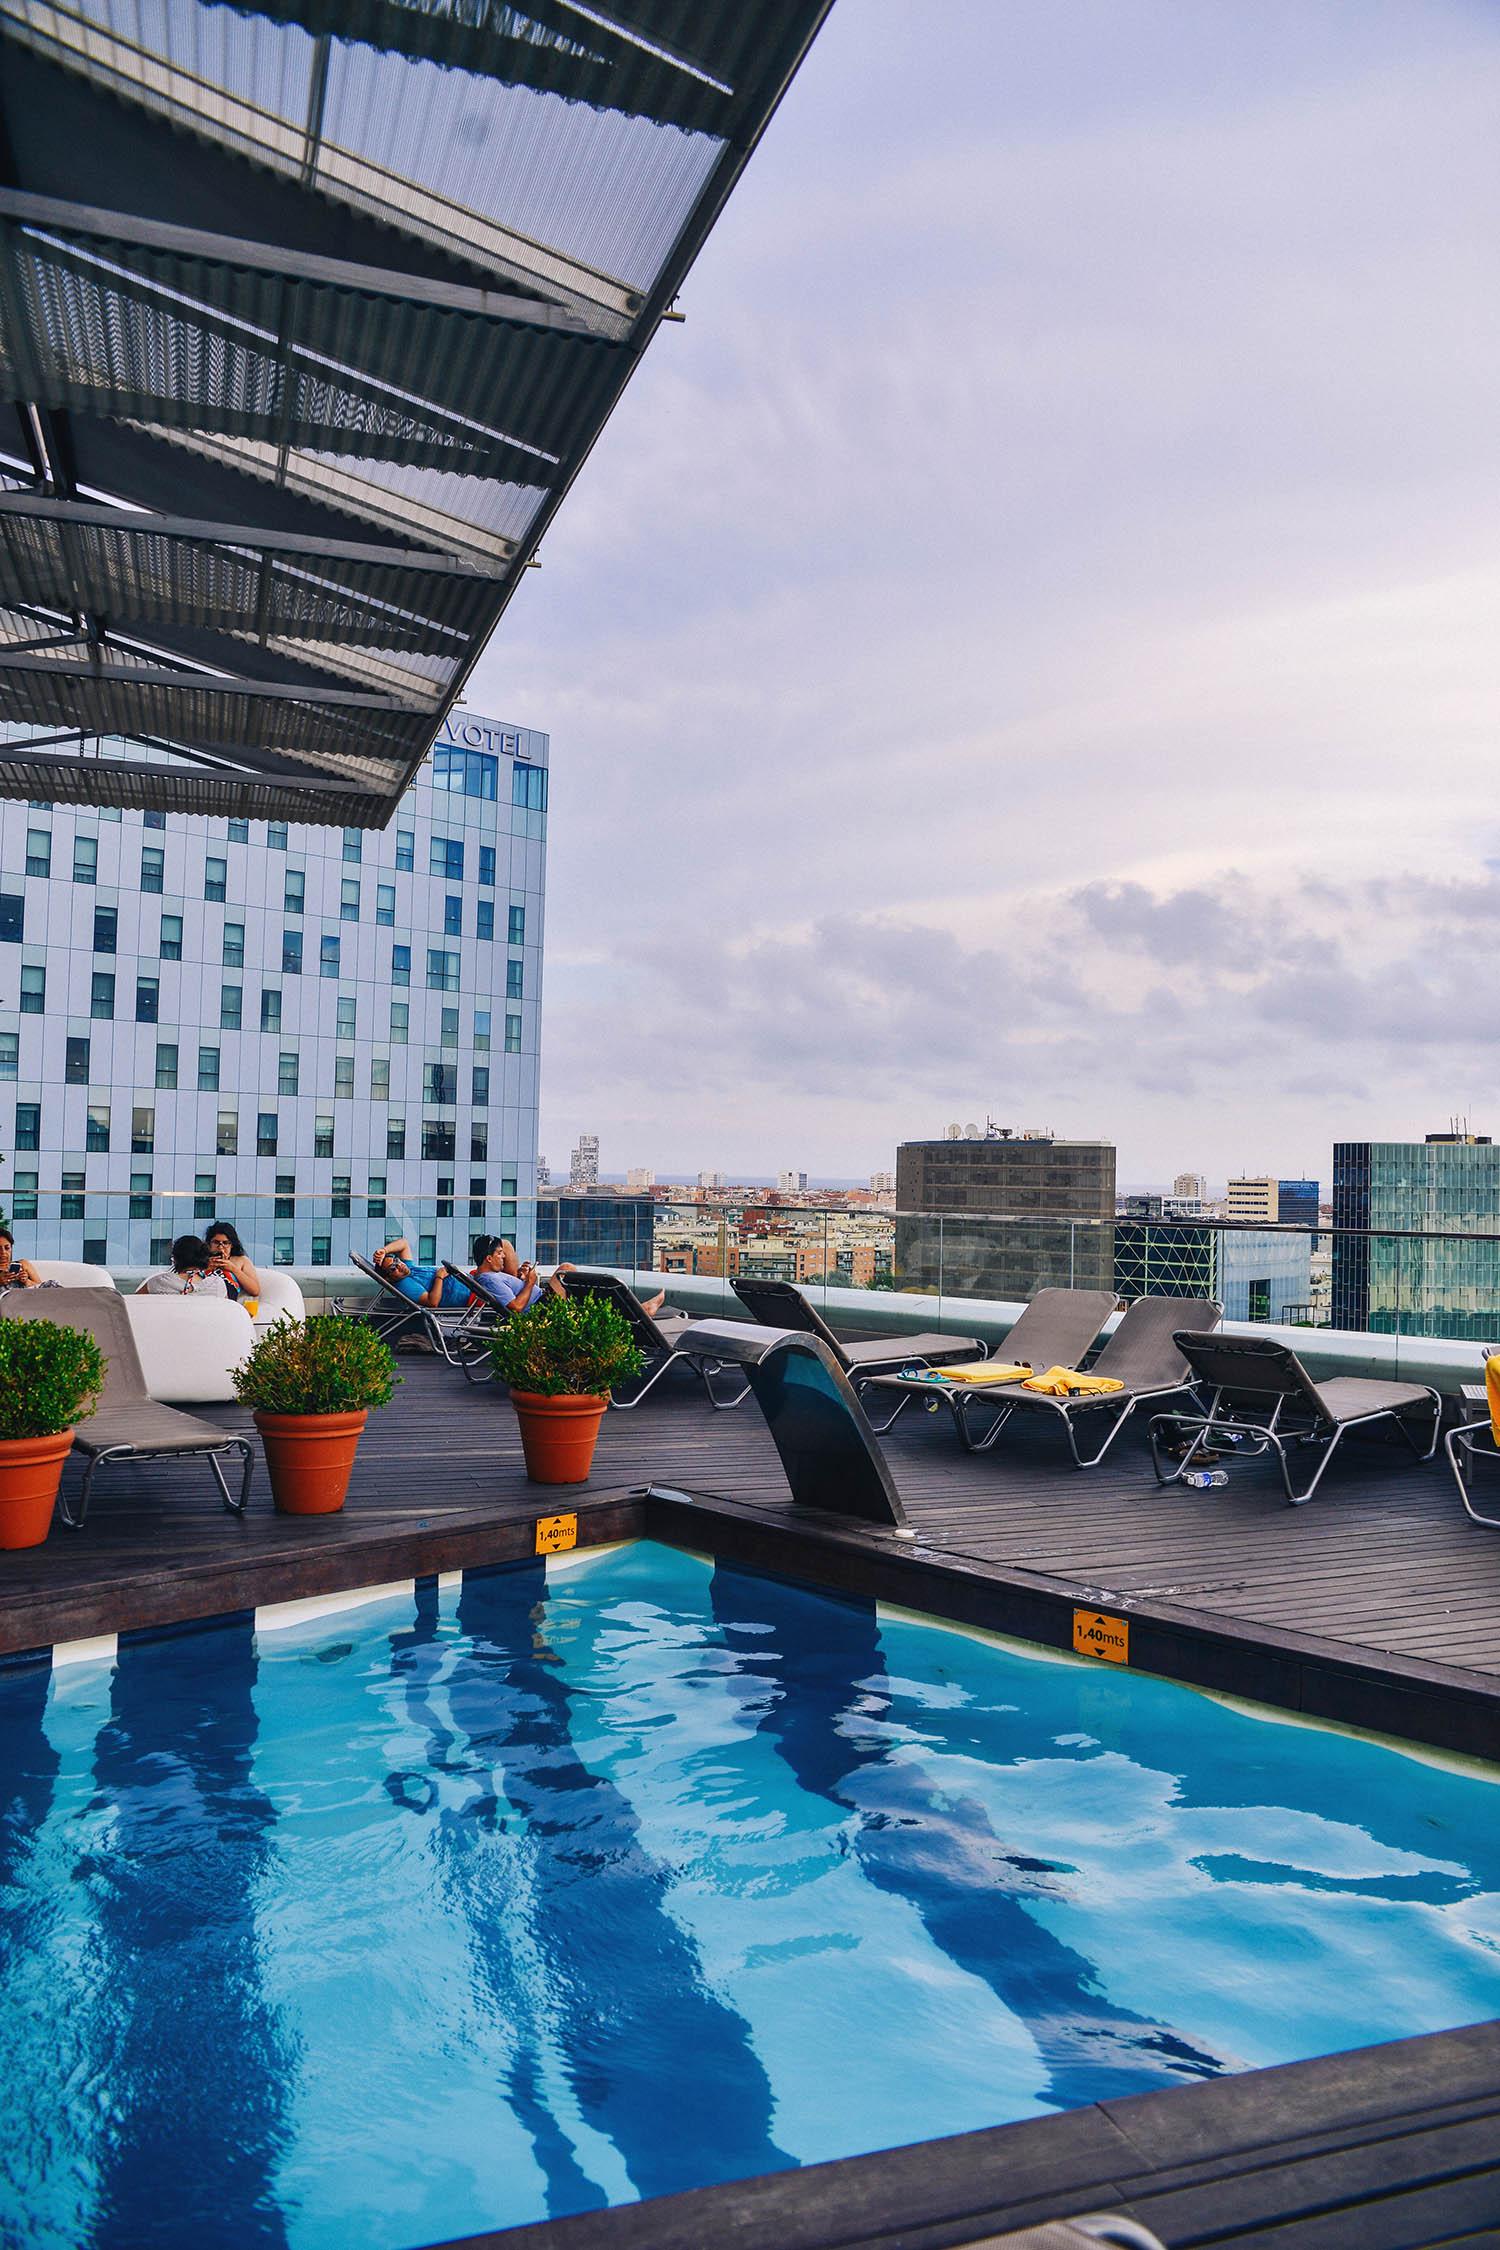 Rooftop pool at Hotel Silken Diagonal